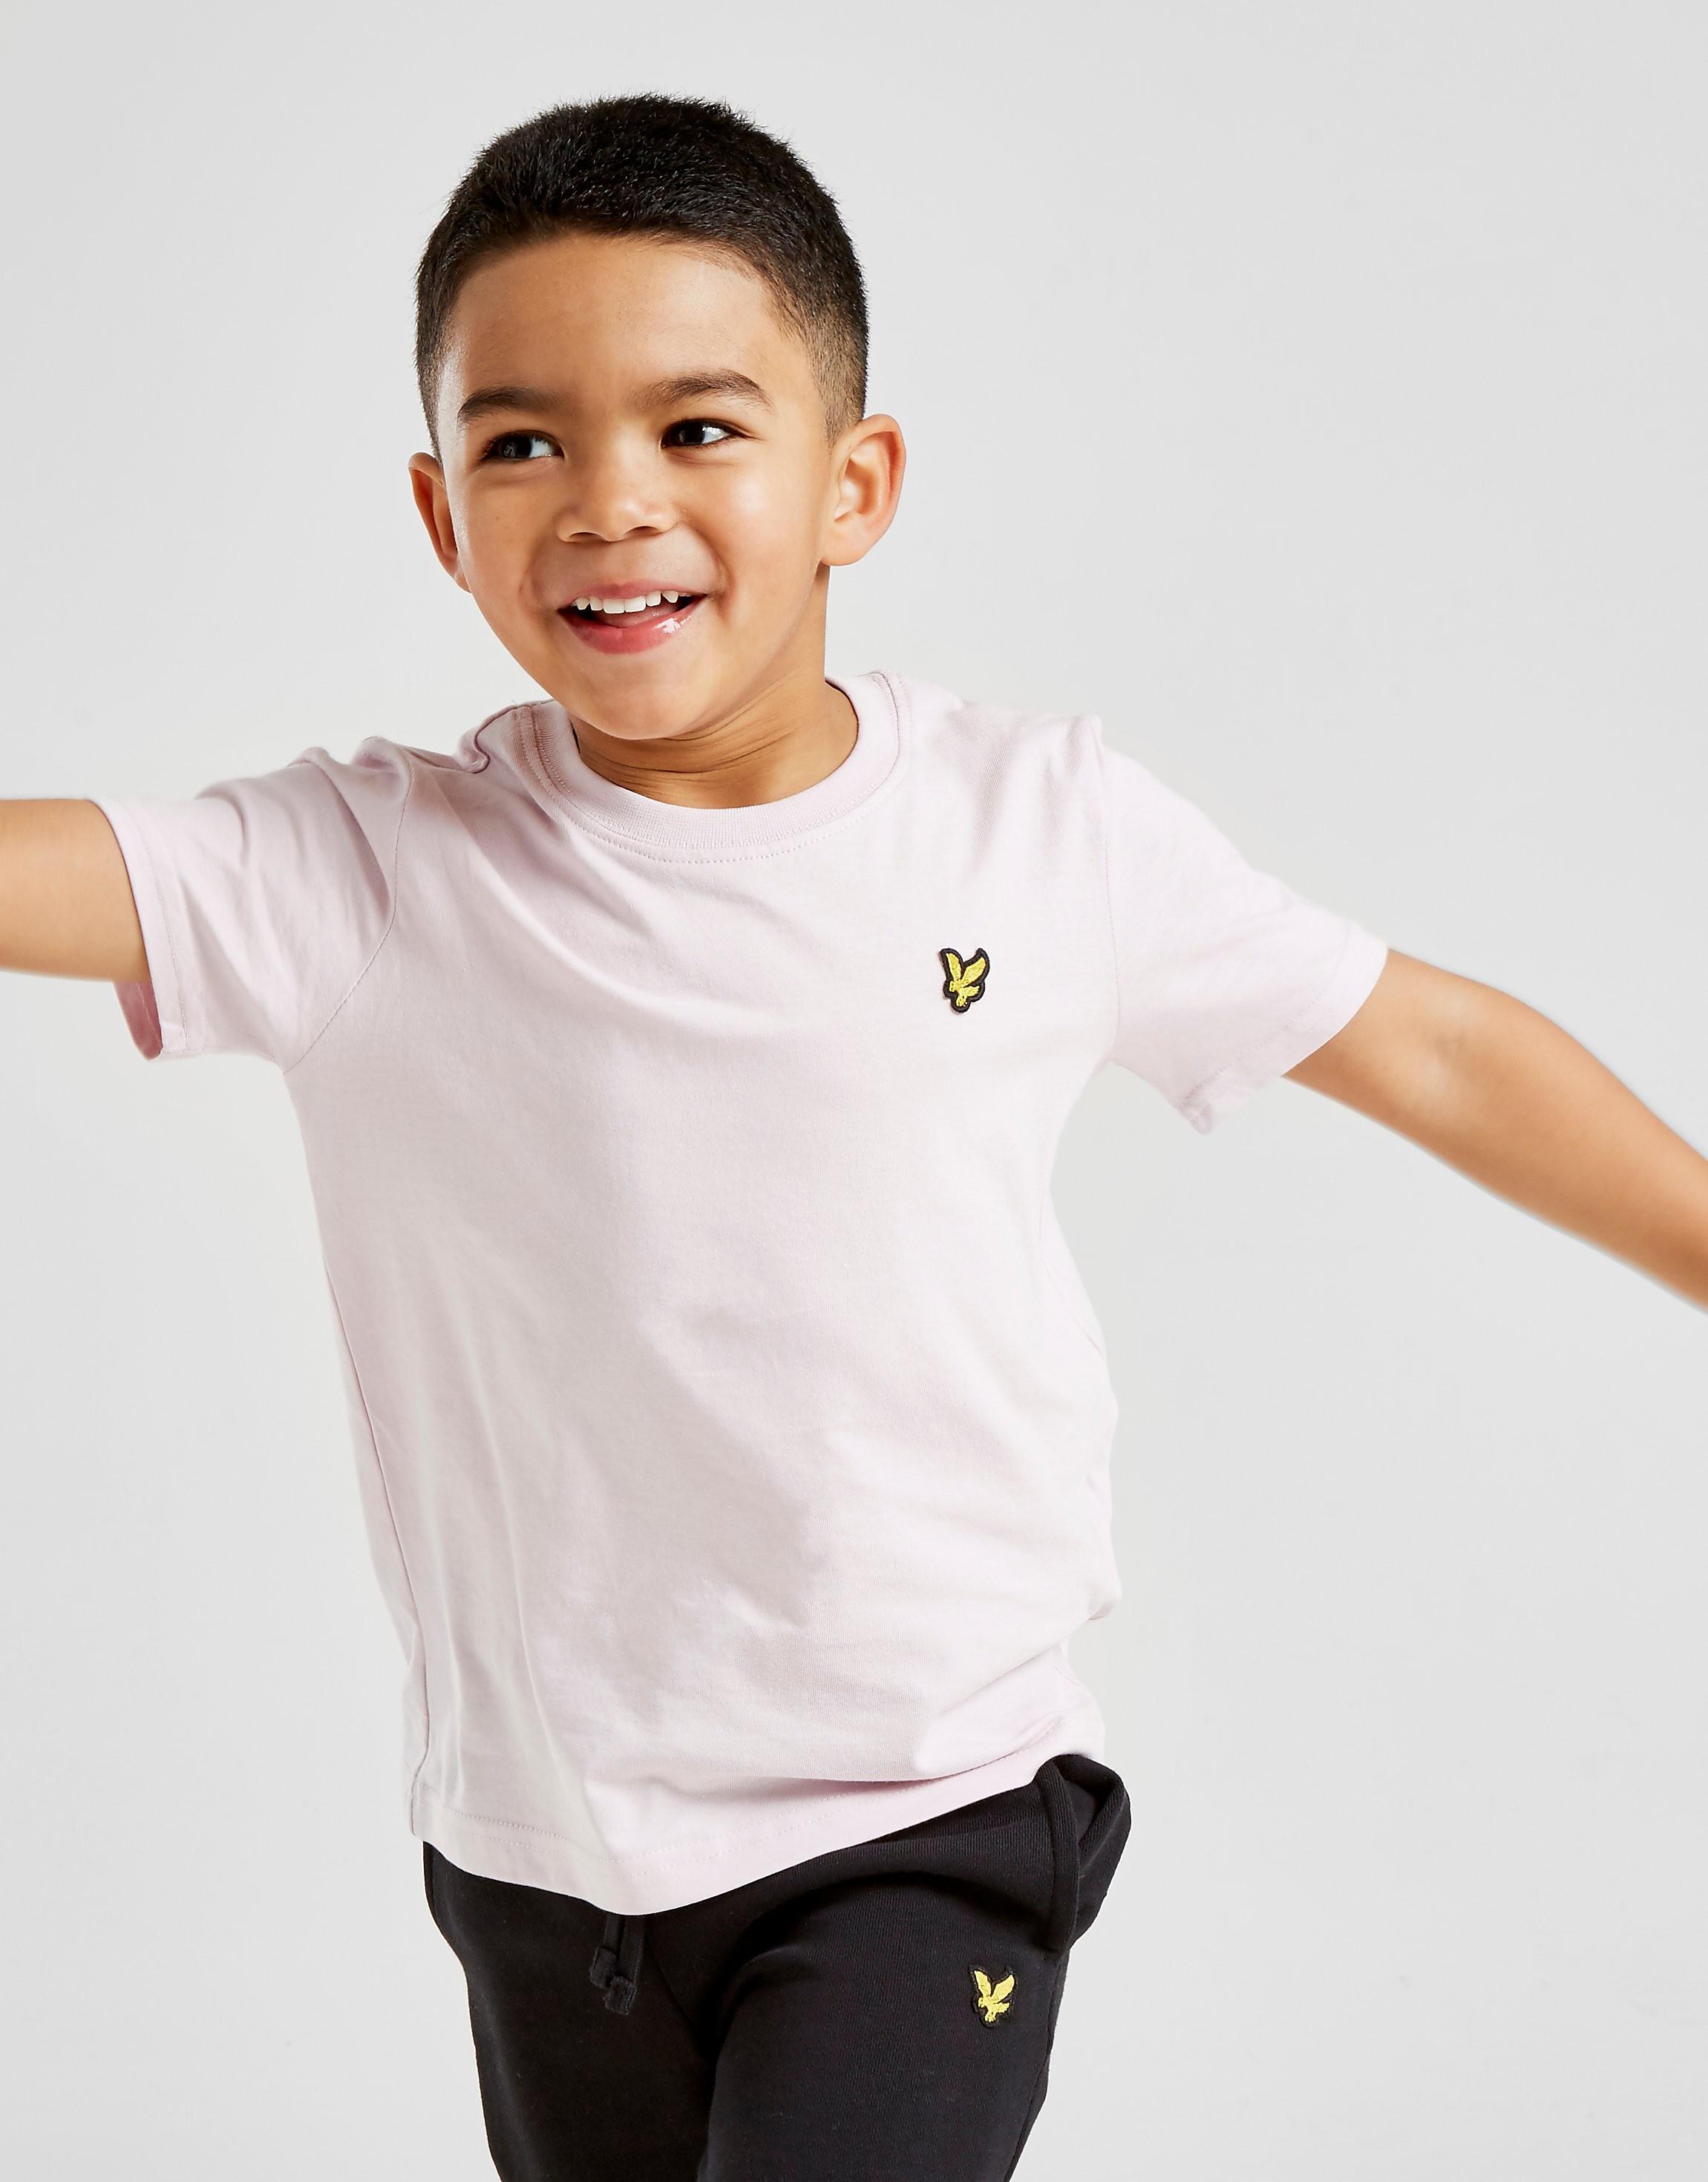 Lyle & Scott Small Logo T-Shirt Children - Roze - Kind